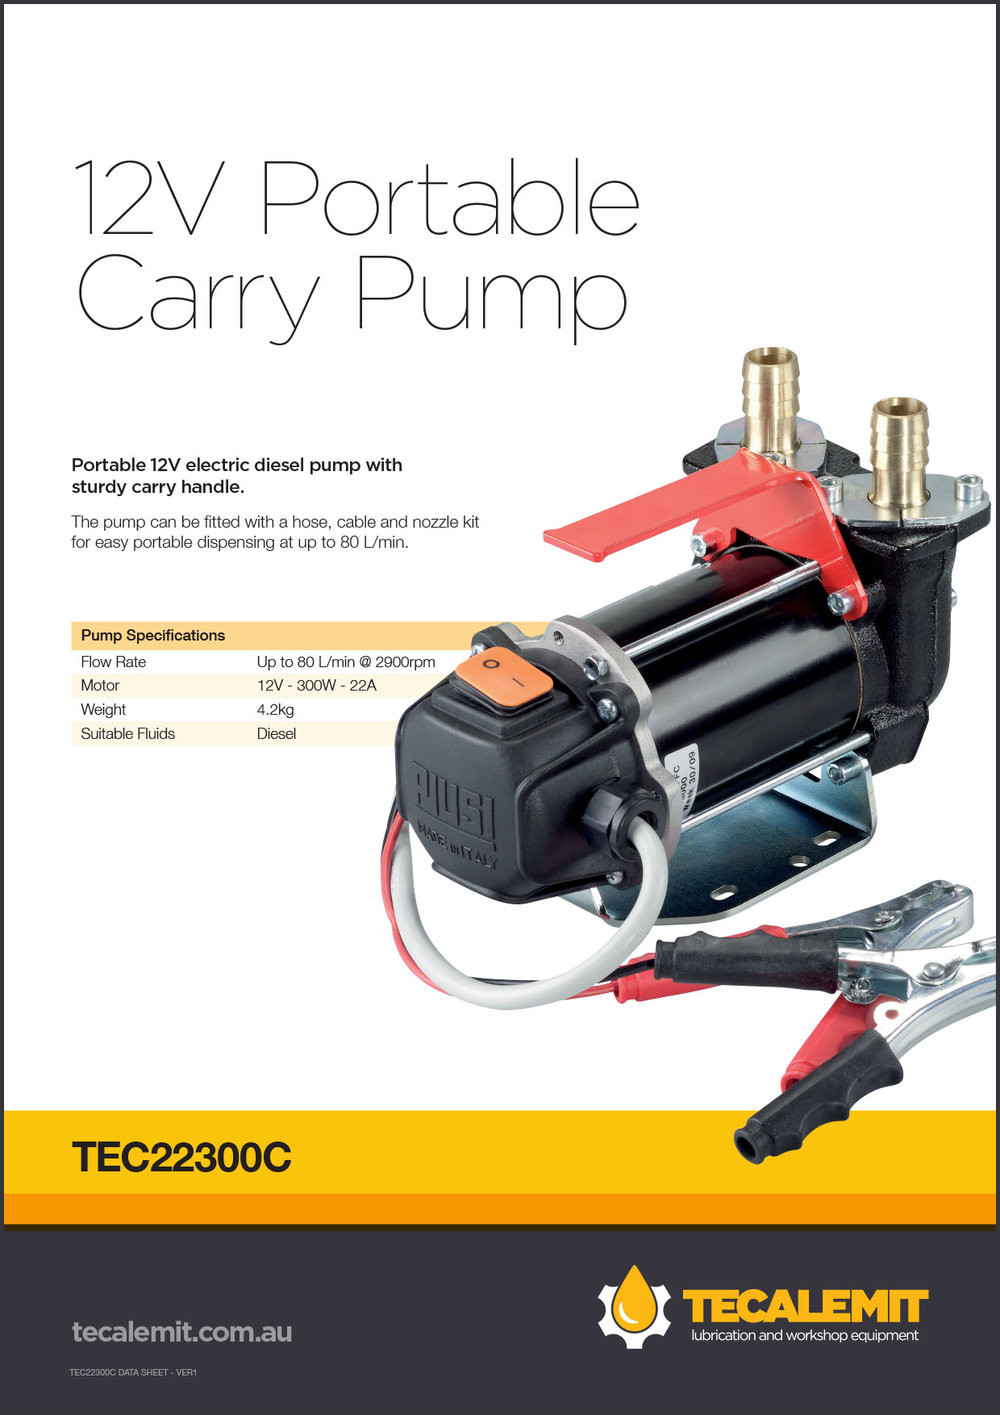 TEC22300C Product Info